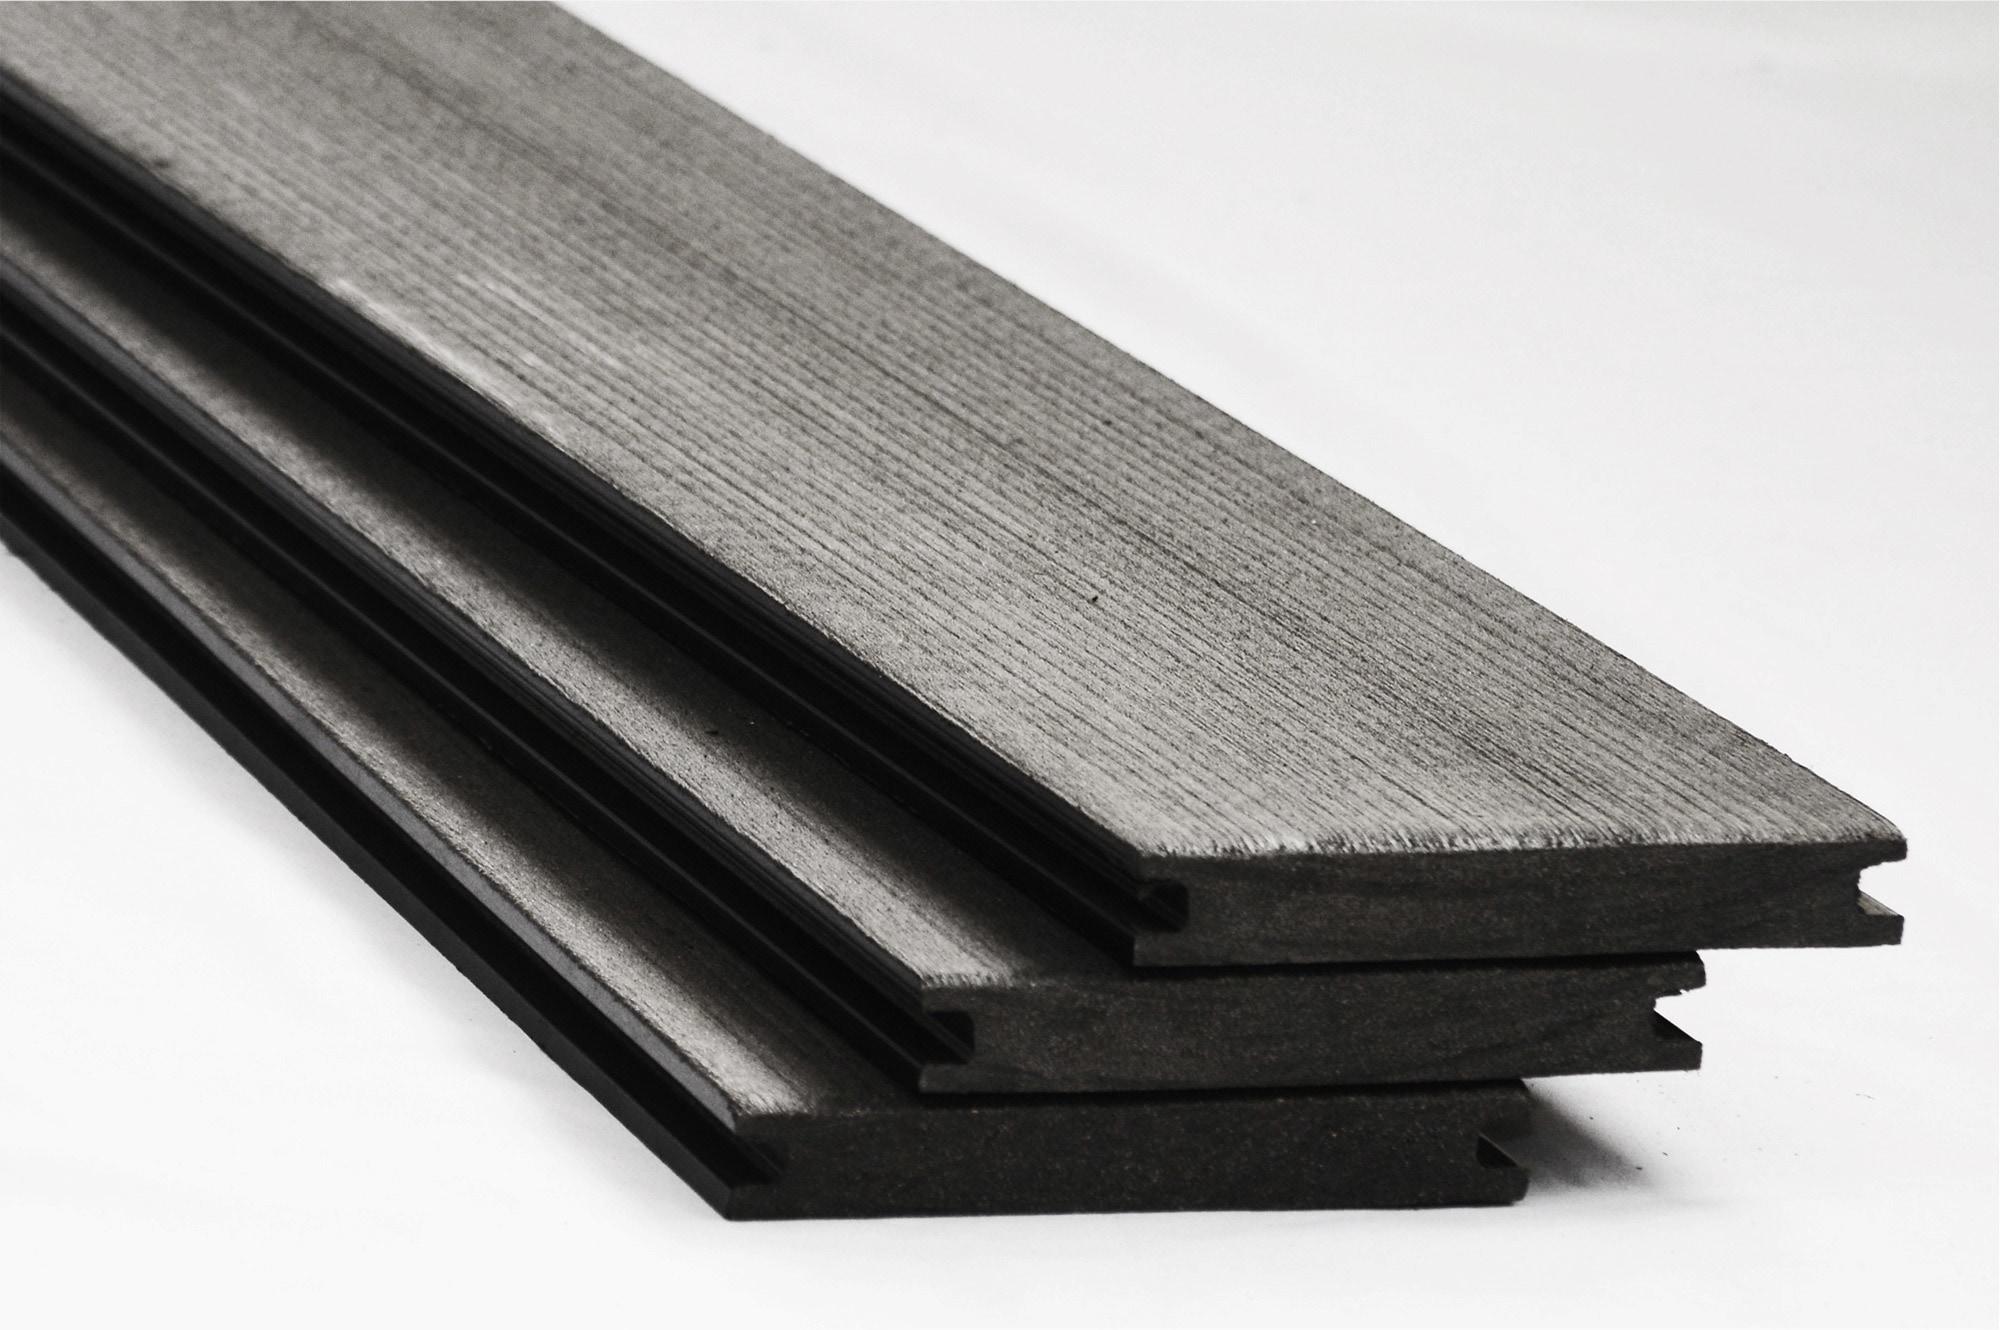 Pravol posite Decking Basics Deck Board Solid Charcoal 1